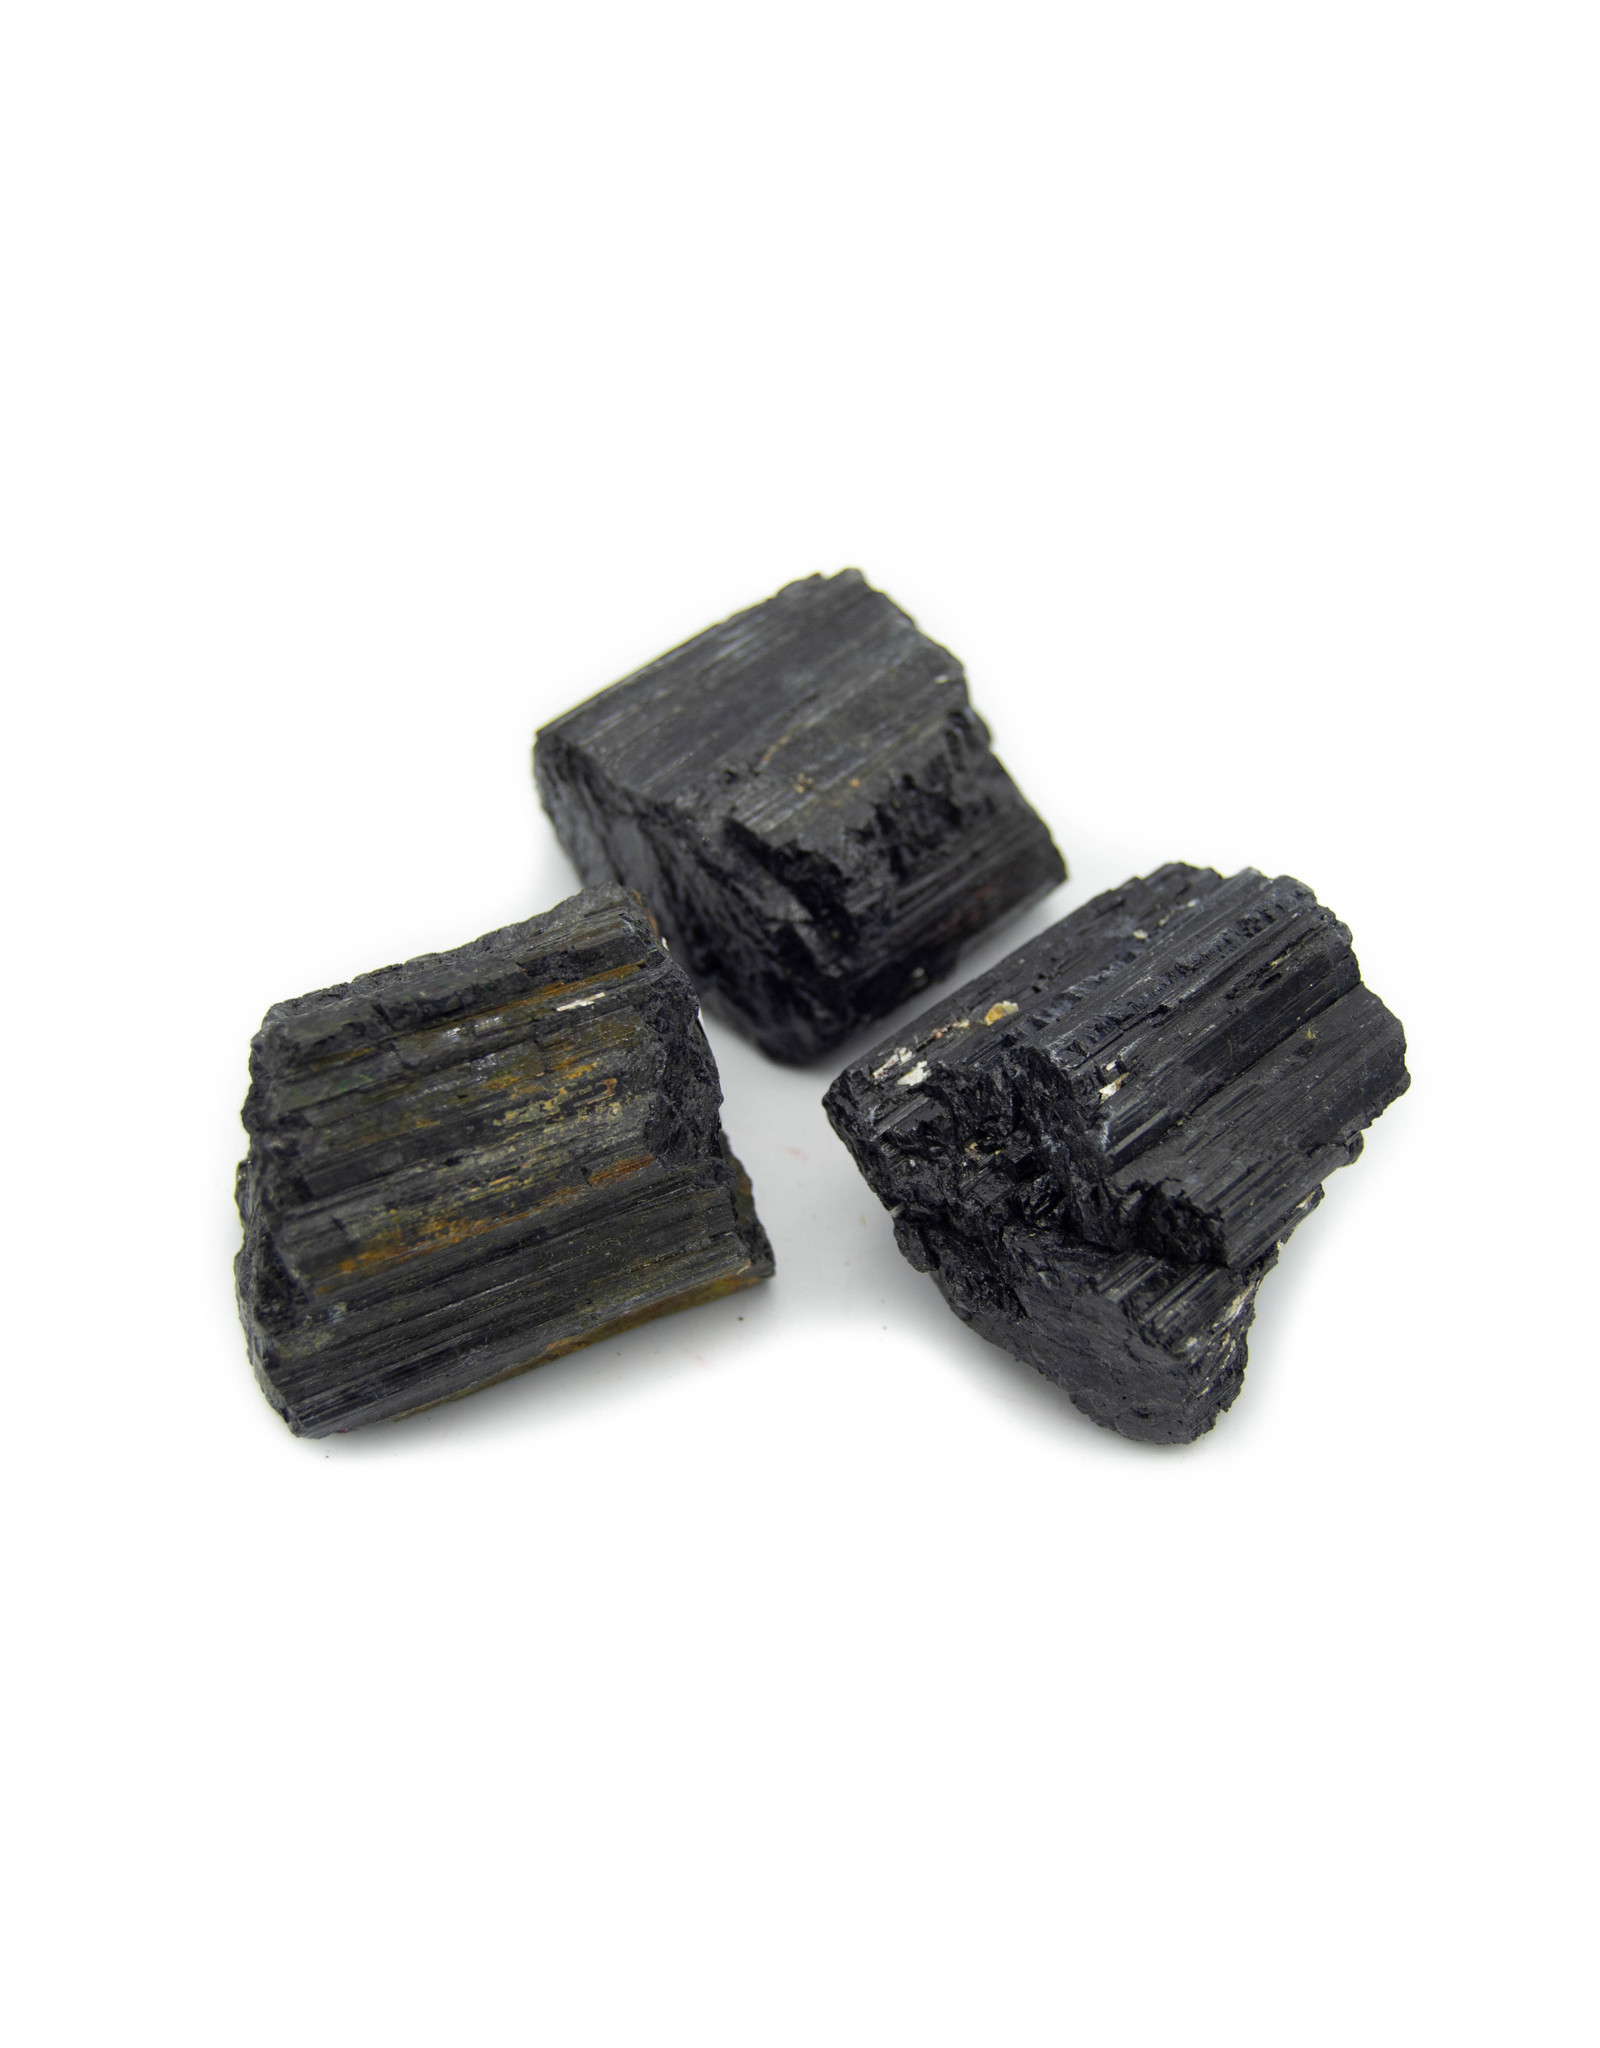 Raw Black Tourmaline